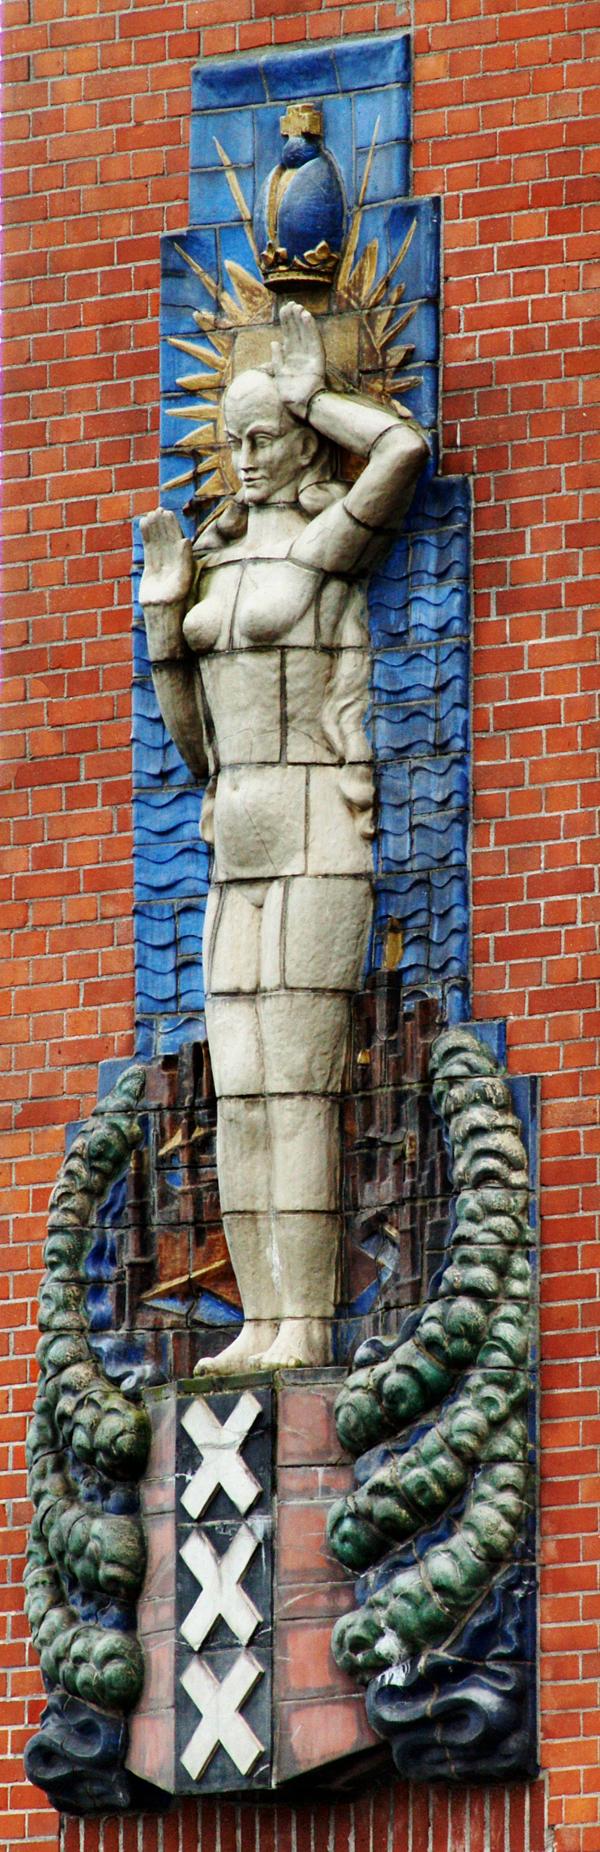 genius van amstel - foto: loek van vlerken 24.01.2012